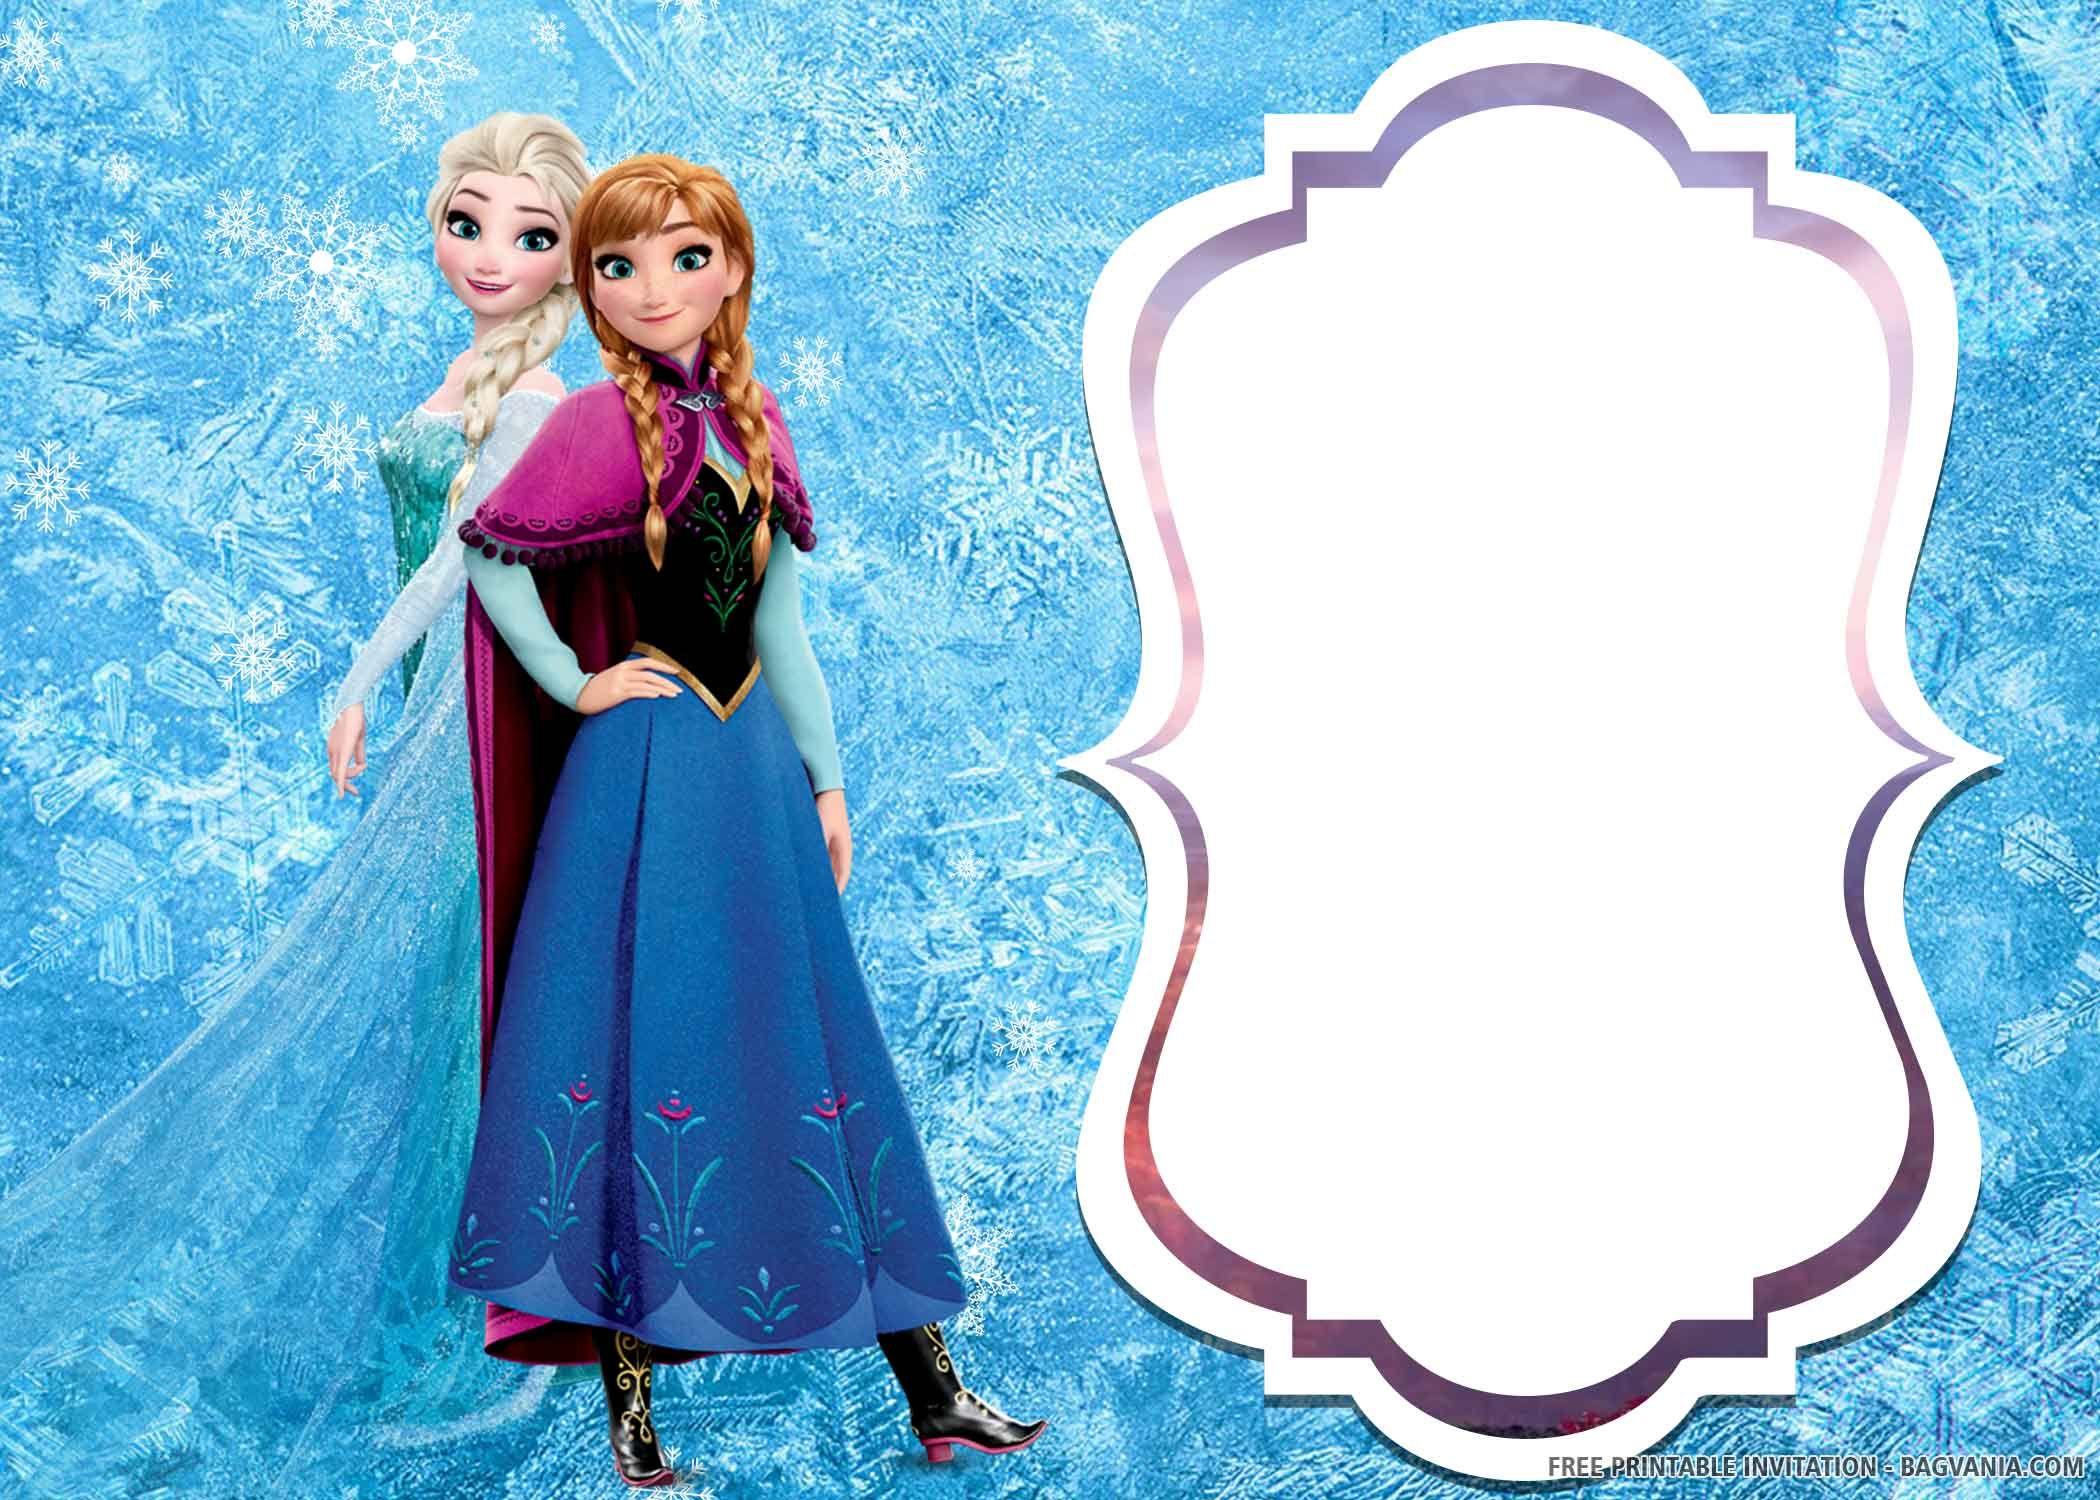 Free Printable Elsa Of Frozen 2 Birthday Invitation Templates 2nd Birthday Invitations Birthday Invitation Templates Frozen Invitations